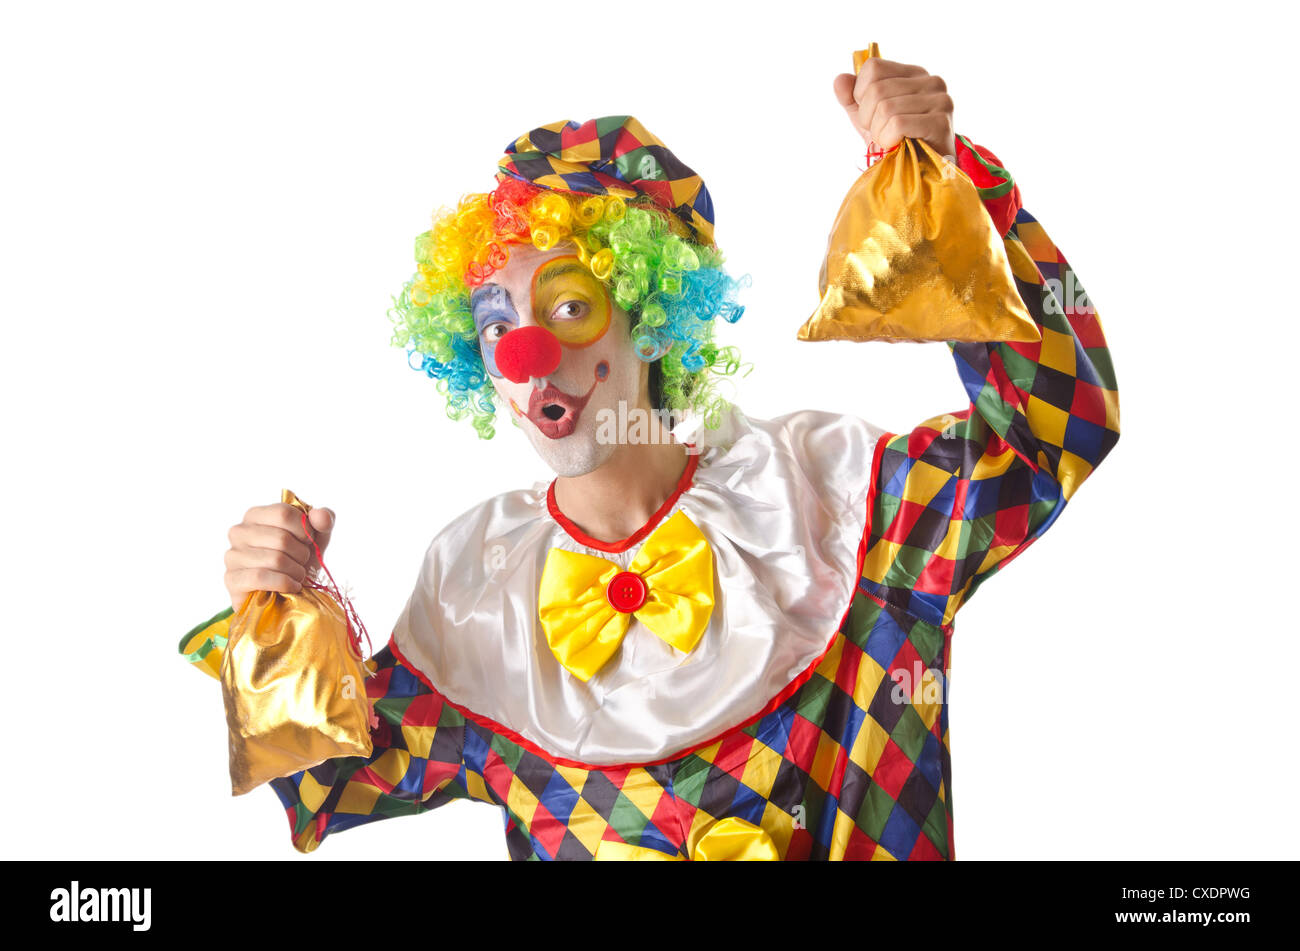 lustiger clown auf dem wei en stockfoto bild 50705132 alamy. Black Bedroom Furniture Sets. Home Design Ideas